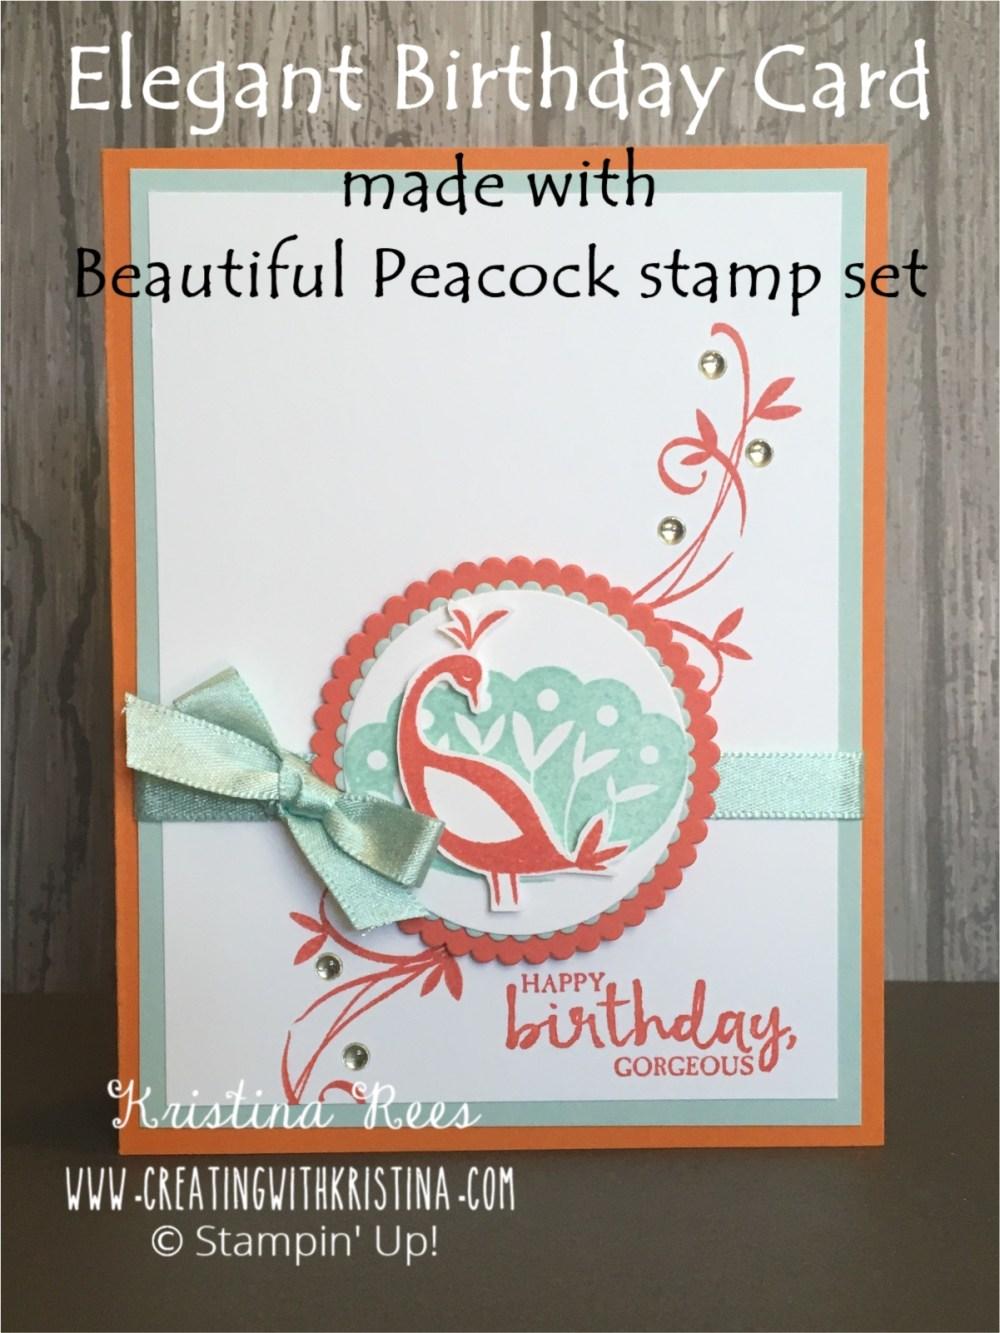 Beautiful Peacock Elegant Birthday Card www.creatingwithkristina.com Title